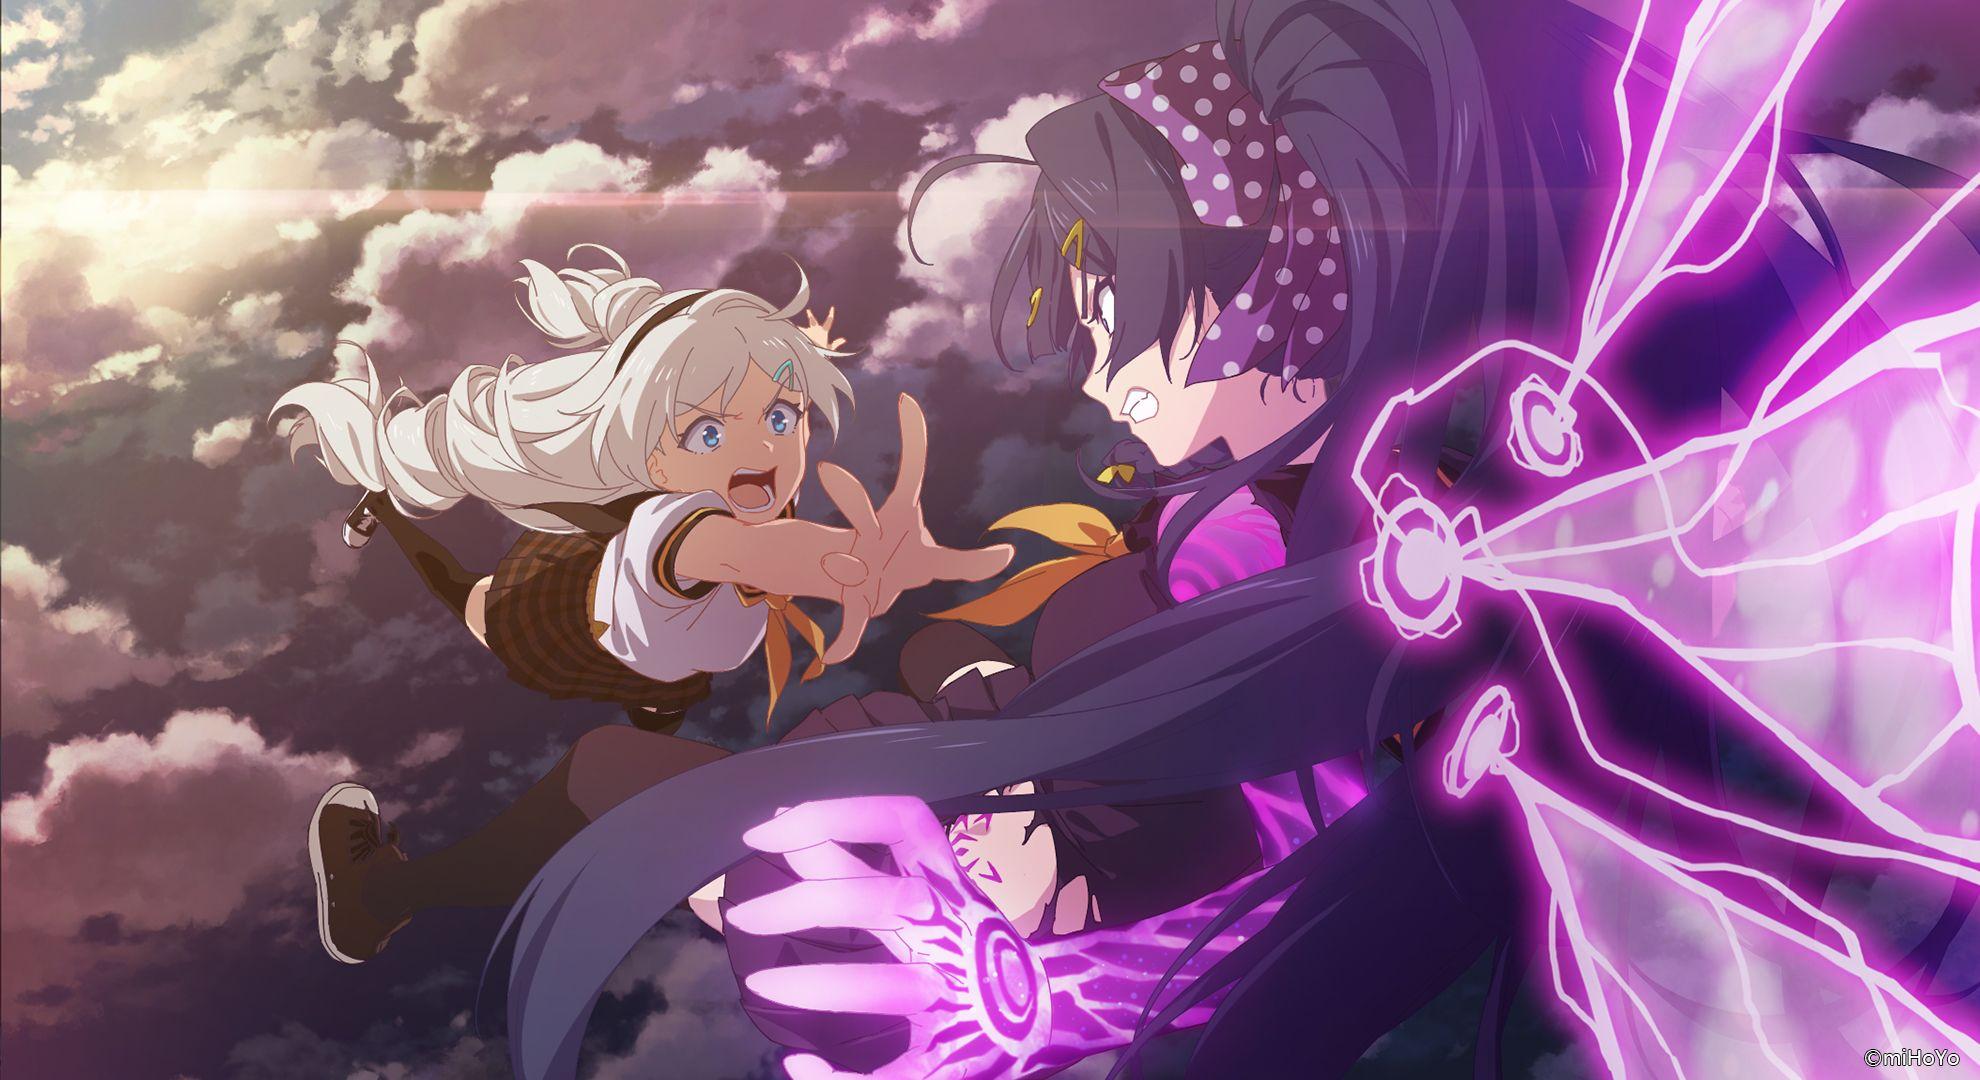 Honkai impact 3rd on twitter anime anime art fantasy